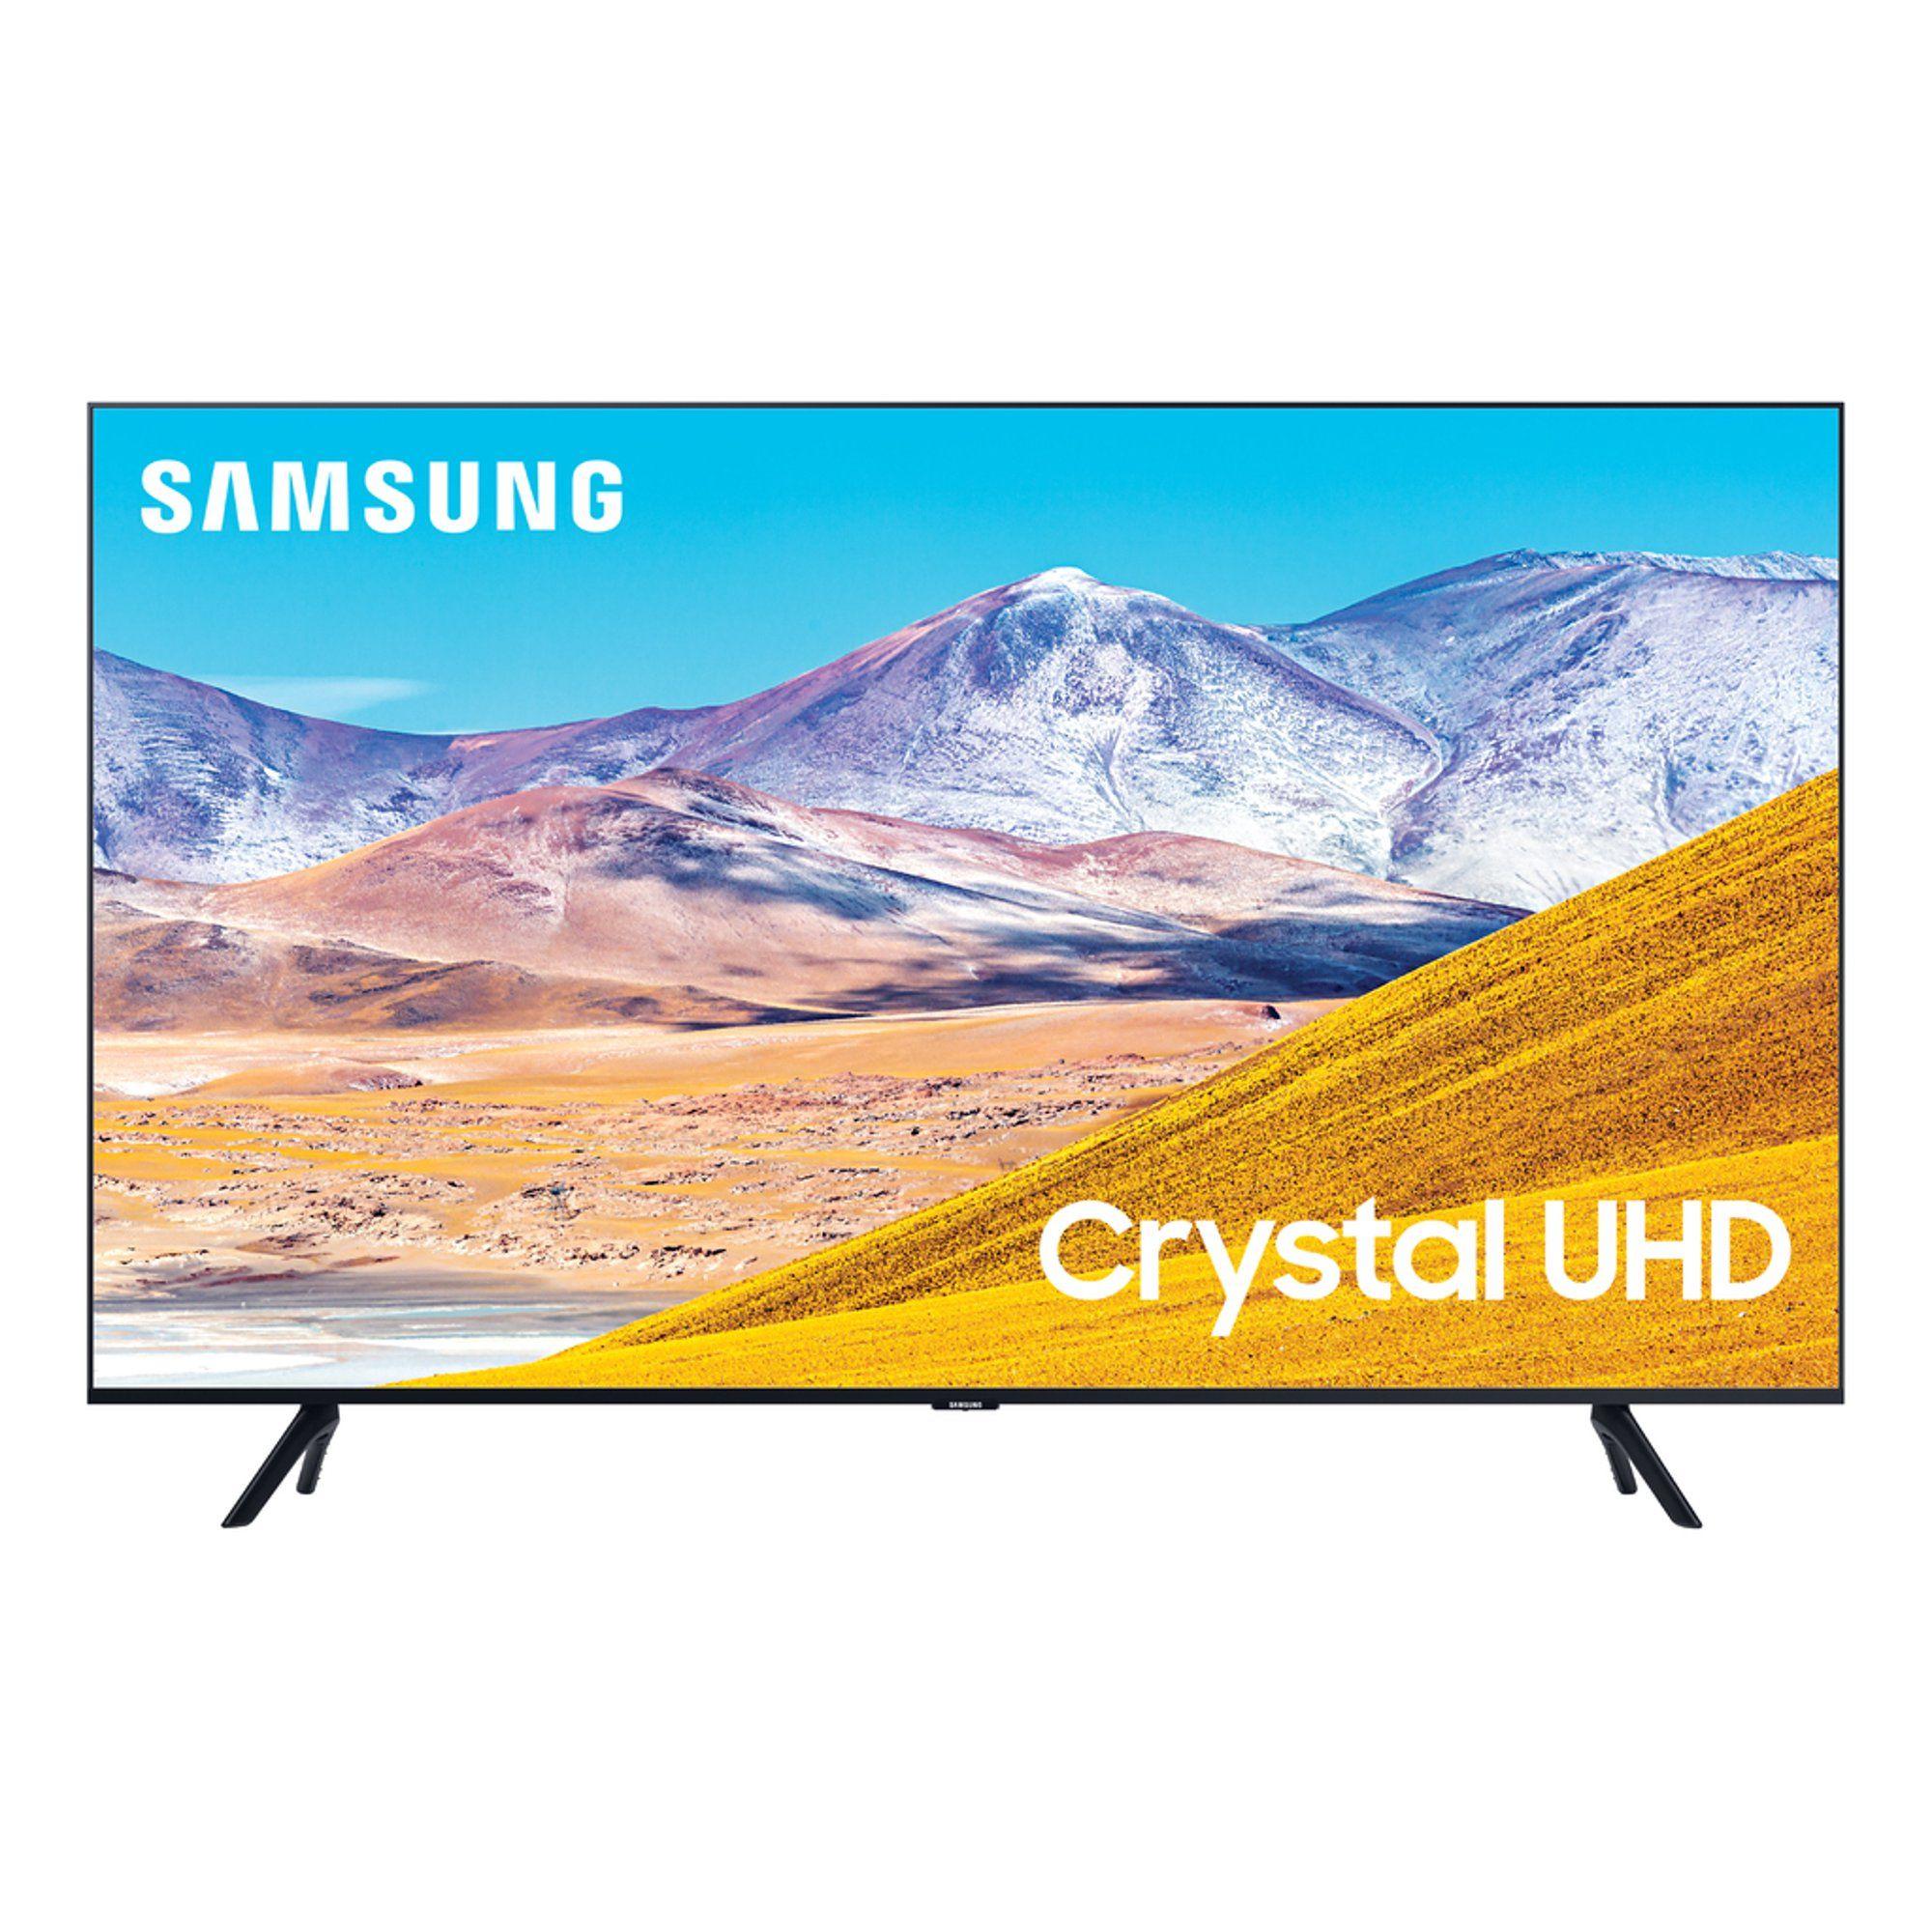 Samsung 43 Class 4k Crystal Uhd 2160p Led Smart Tv With Hdr Un43tu8200 2020 Walmart Com Smart Tv Samsung Smart Tv Samsung 85